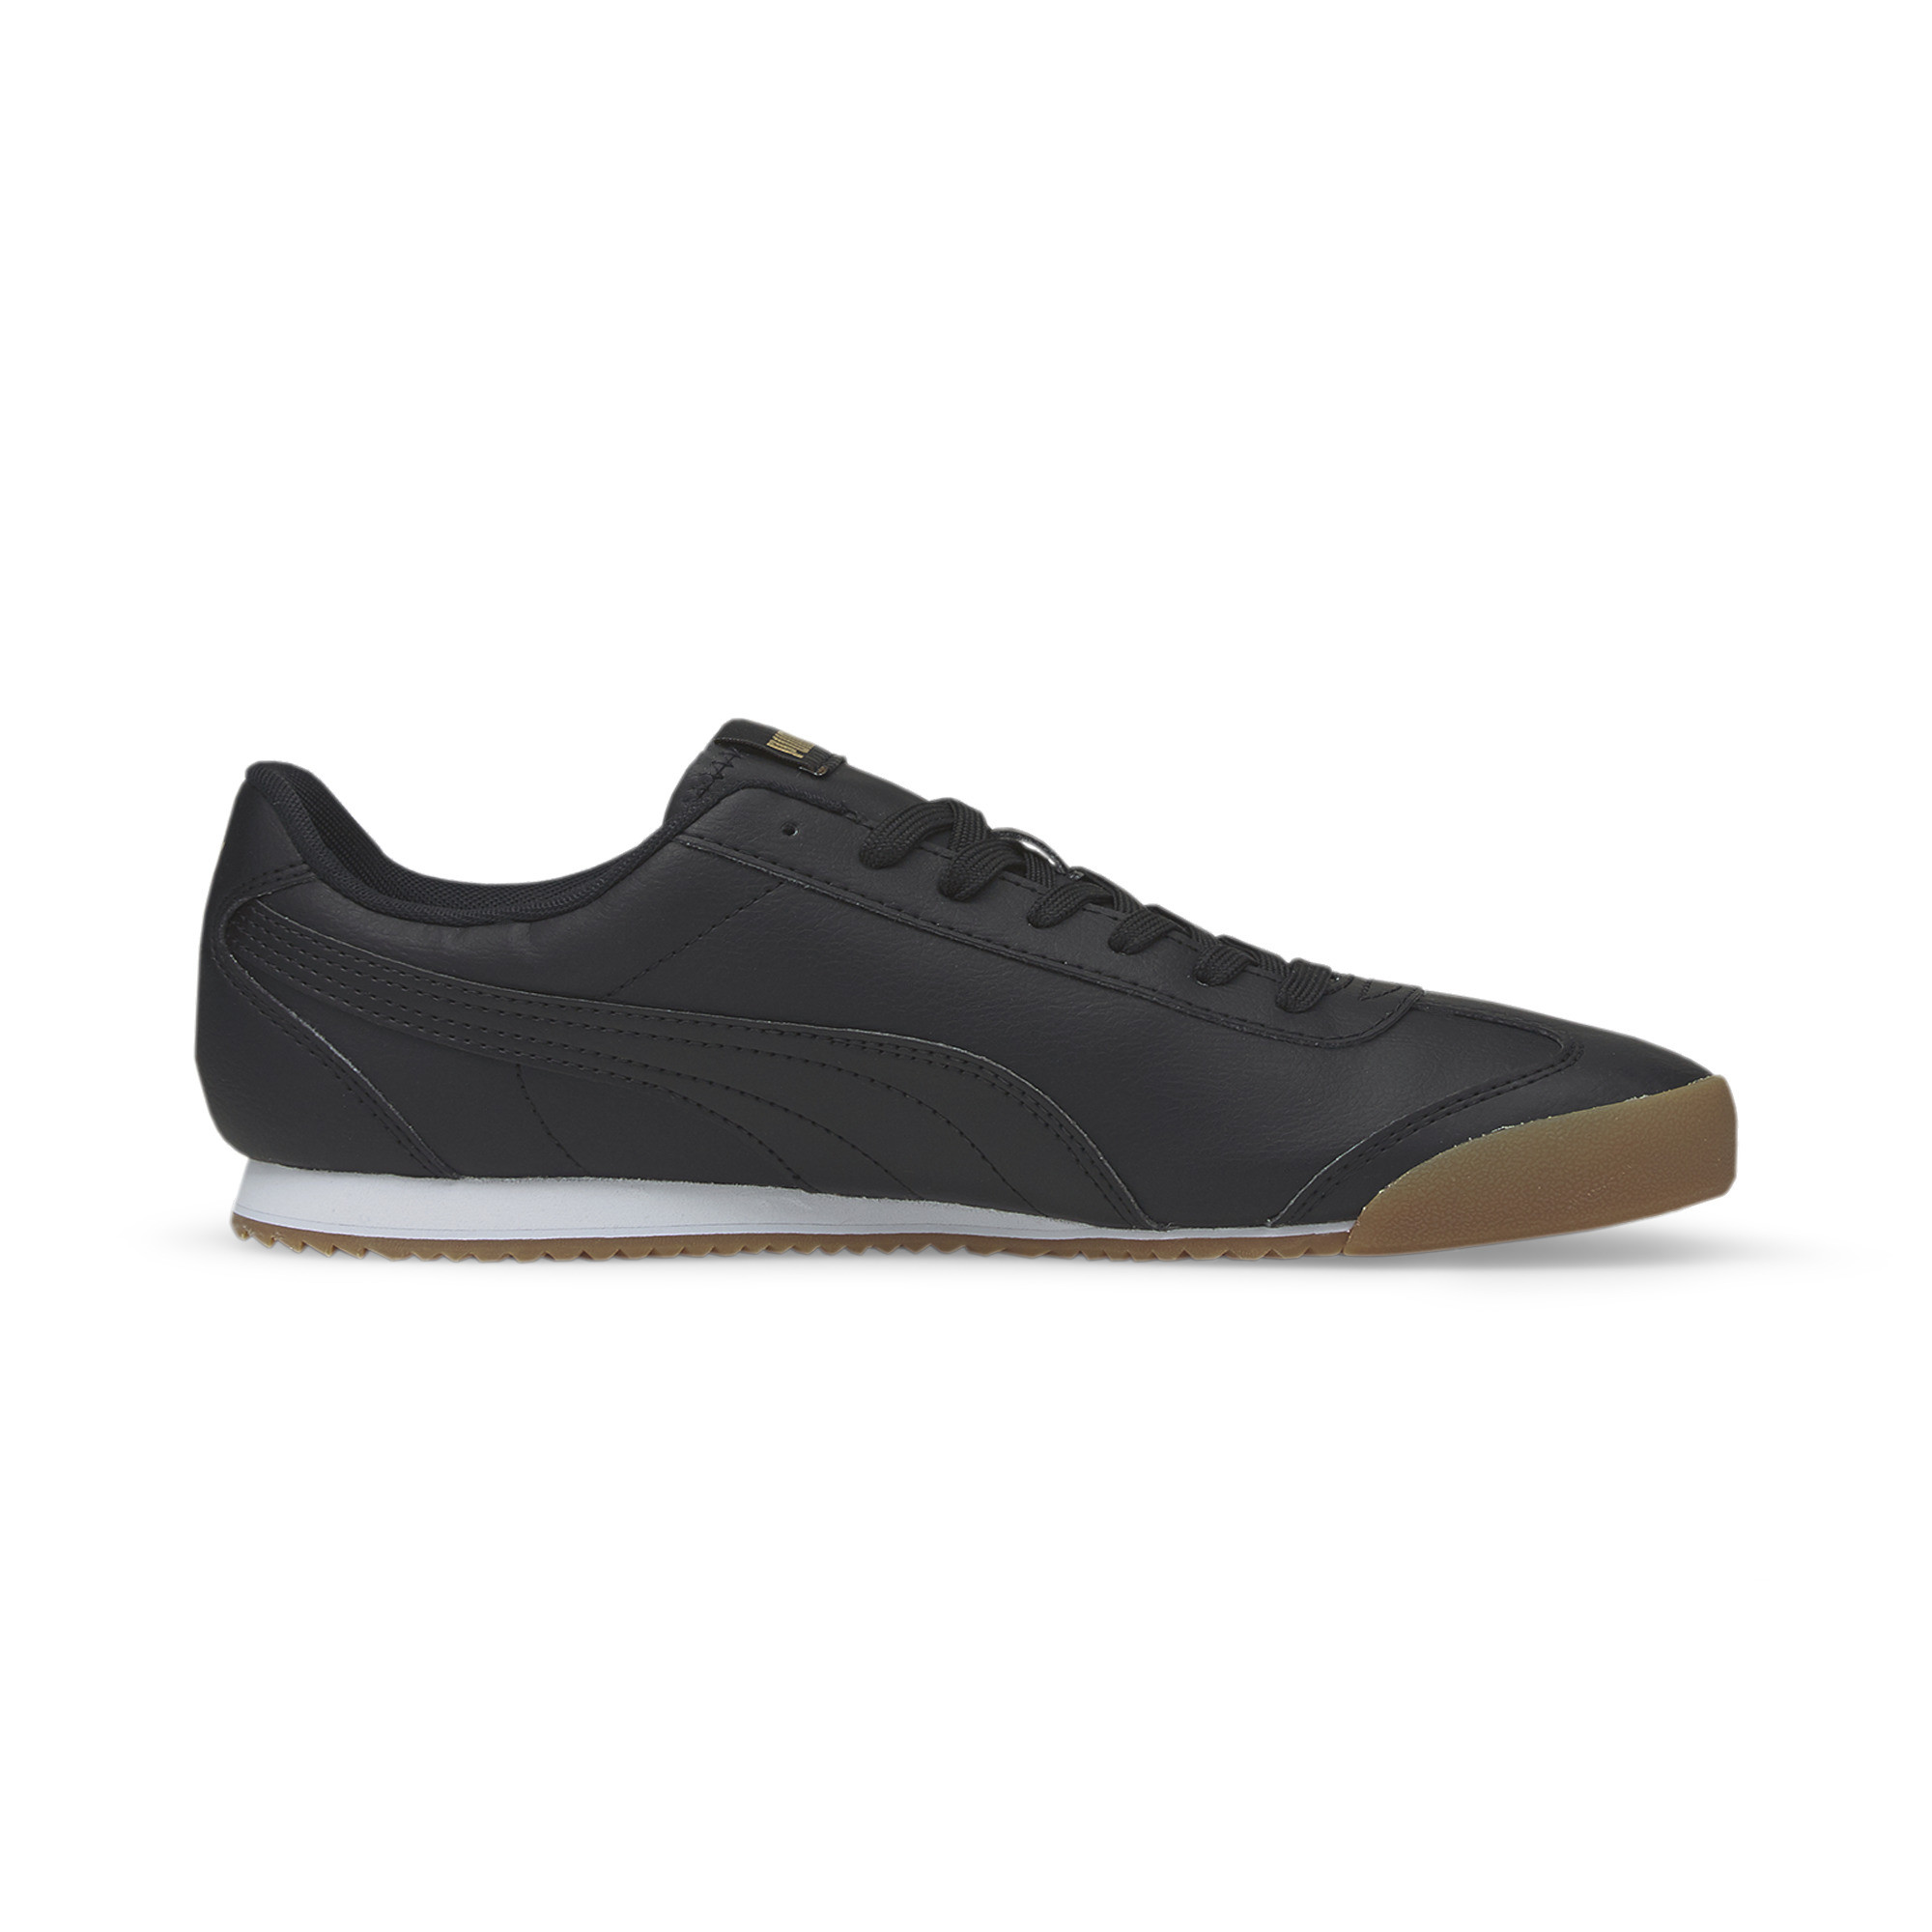 thumbnail 7 - PUMA Men's Turino SL Sneakers